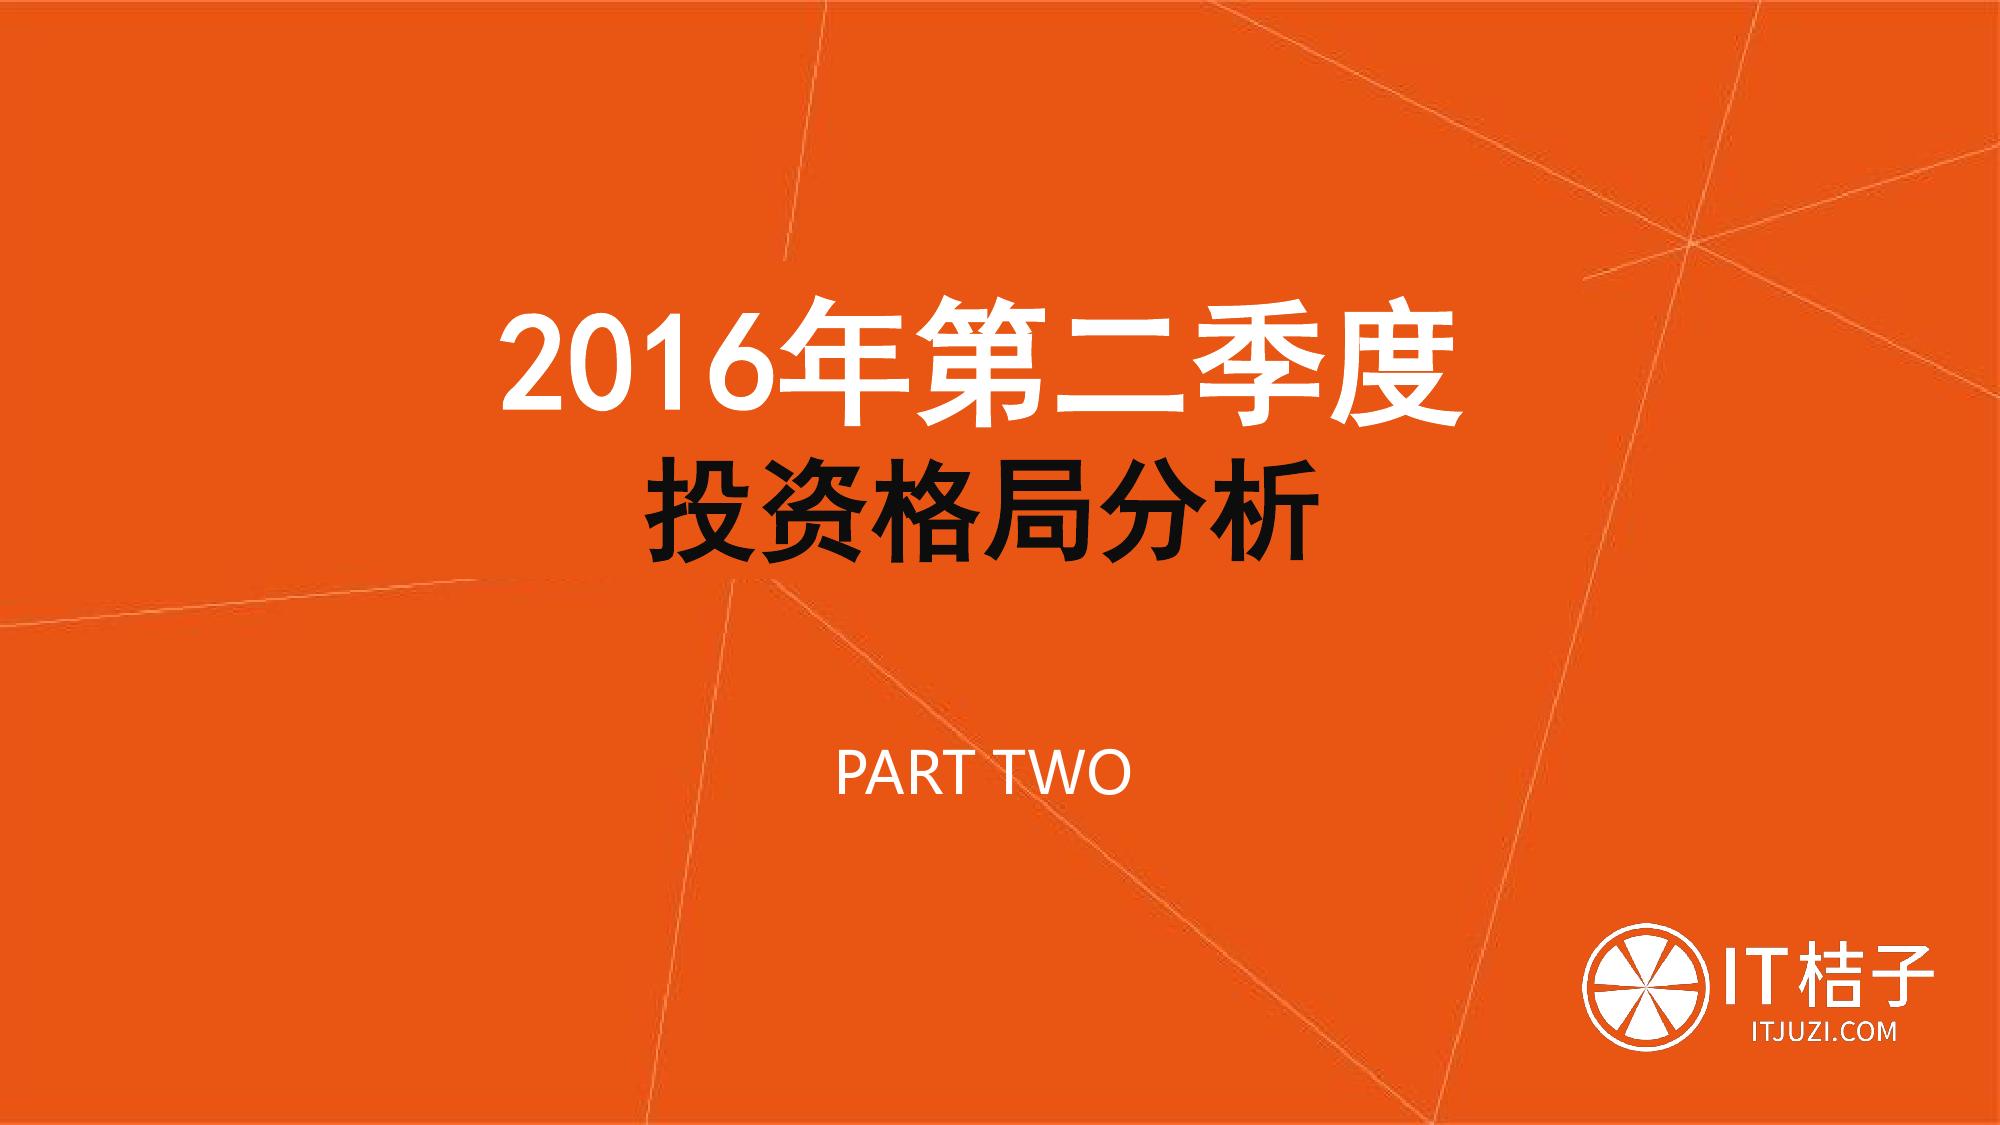 【IT桔子】2016年Q2中国互联网创业投资分析报告_000010